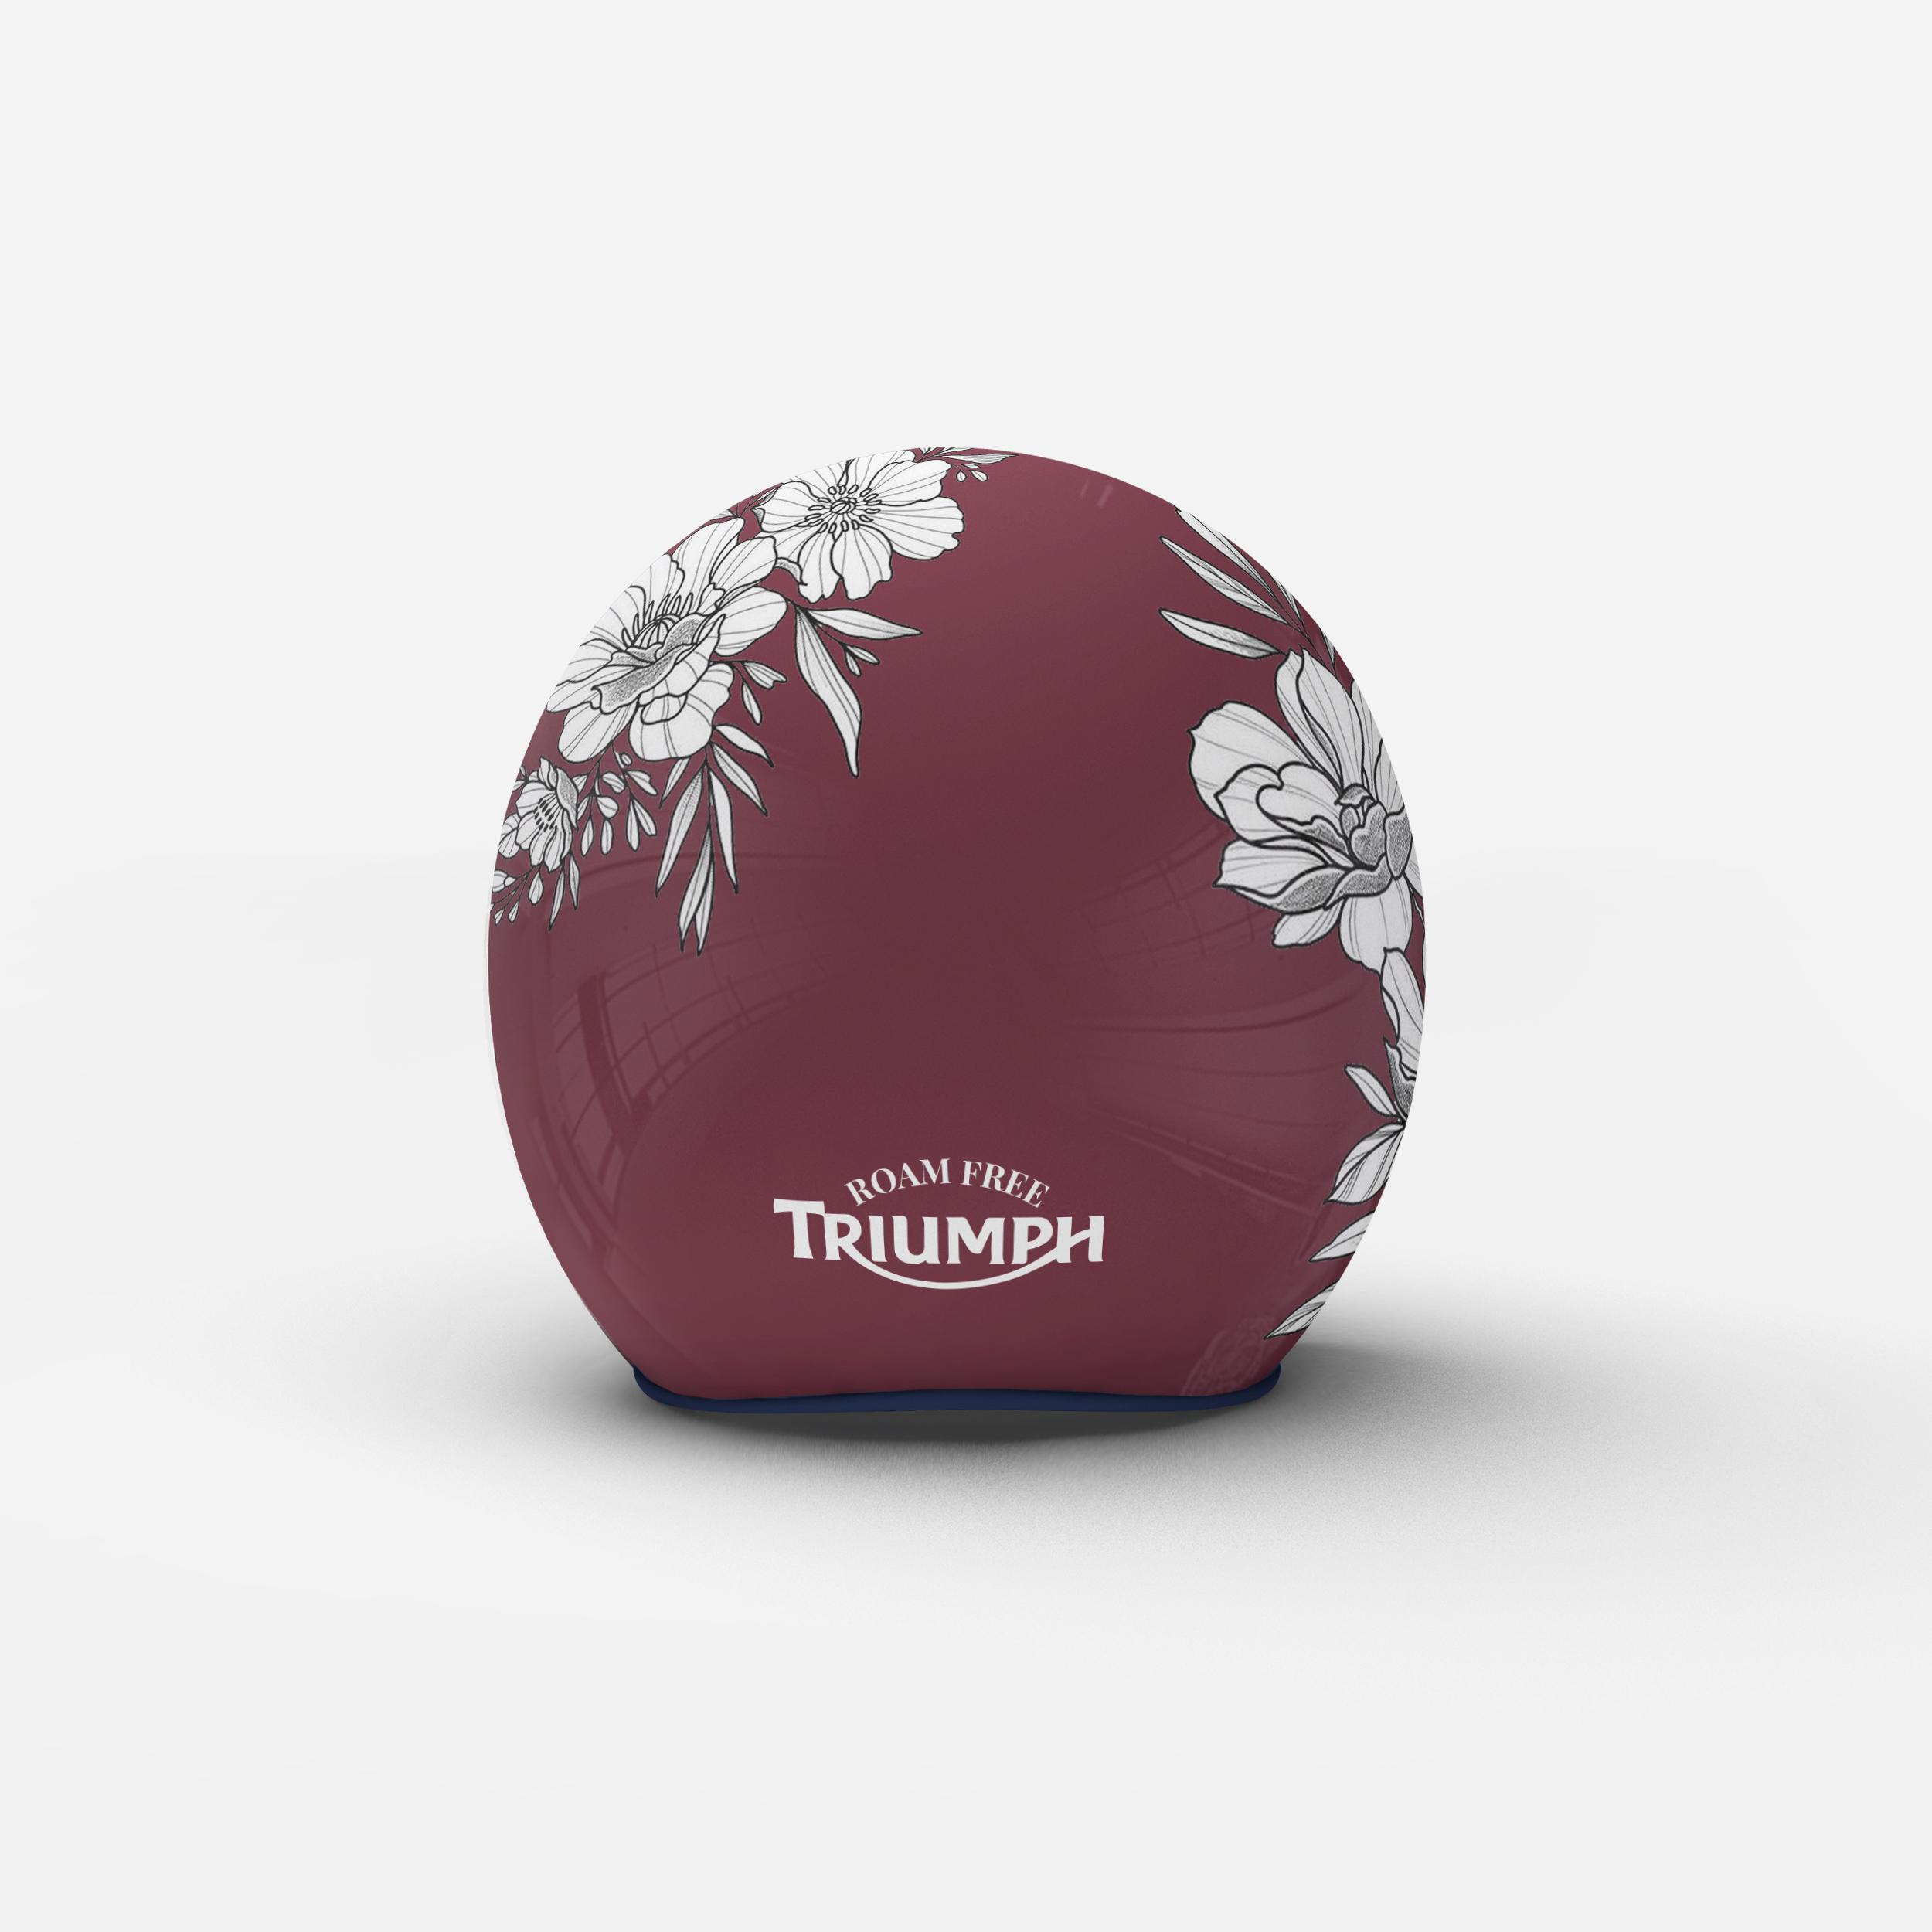 TriumphBackHelmet.jpg